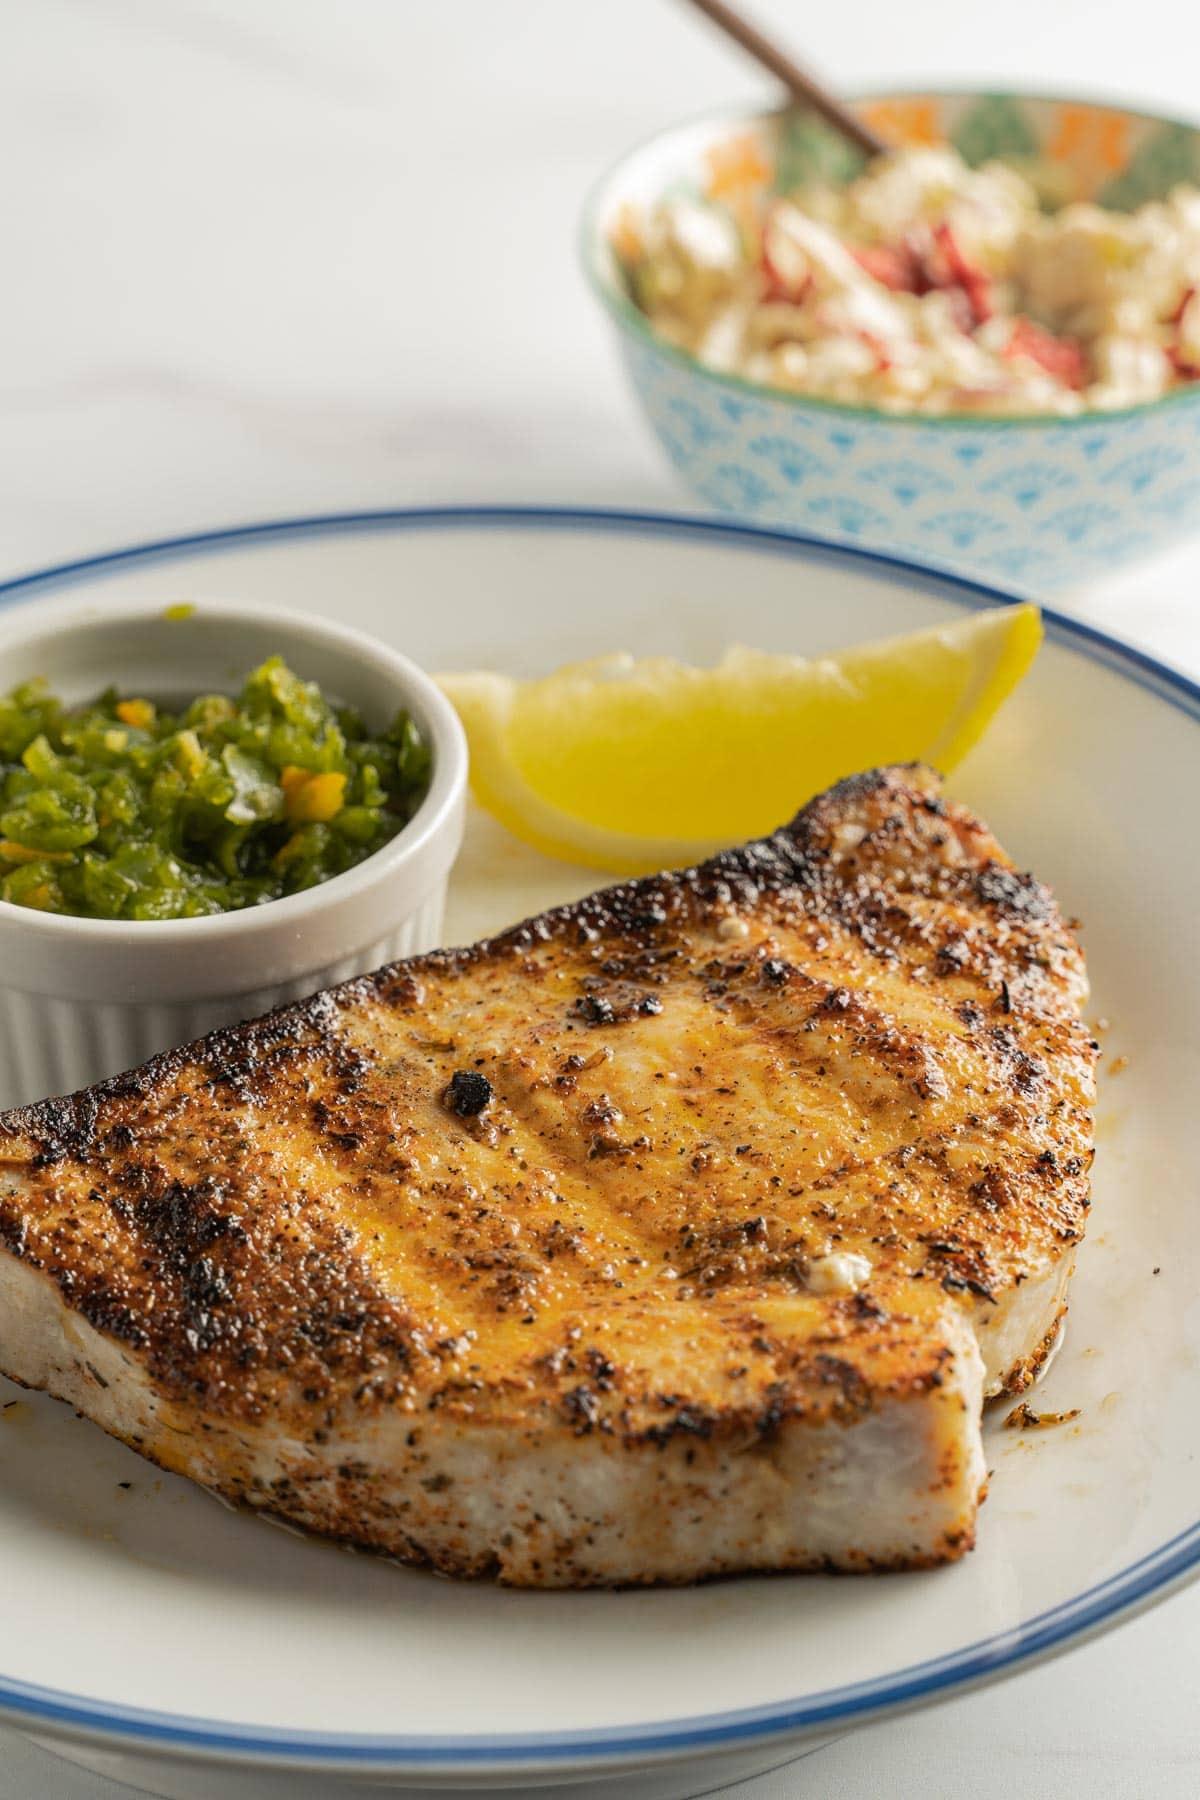 Blackened swordfish on plate with relish and lemon